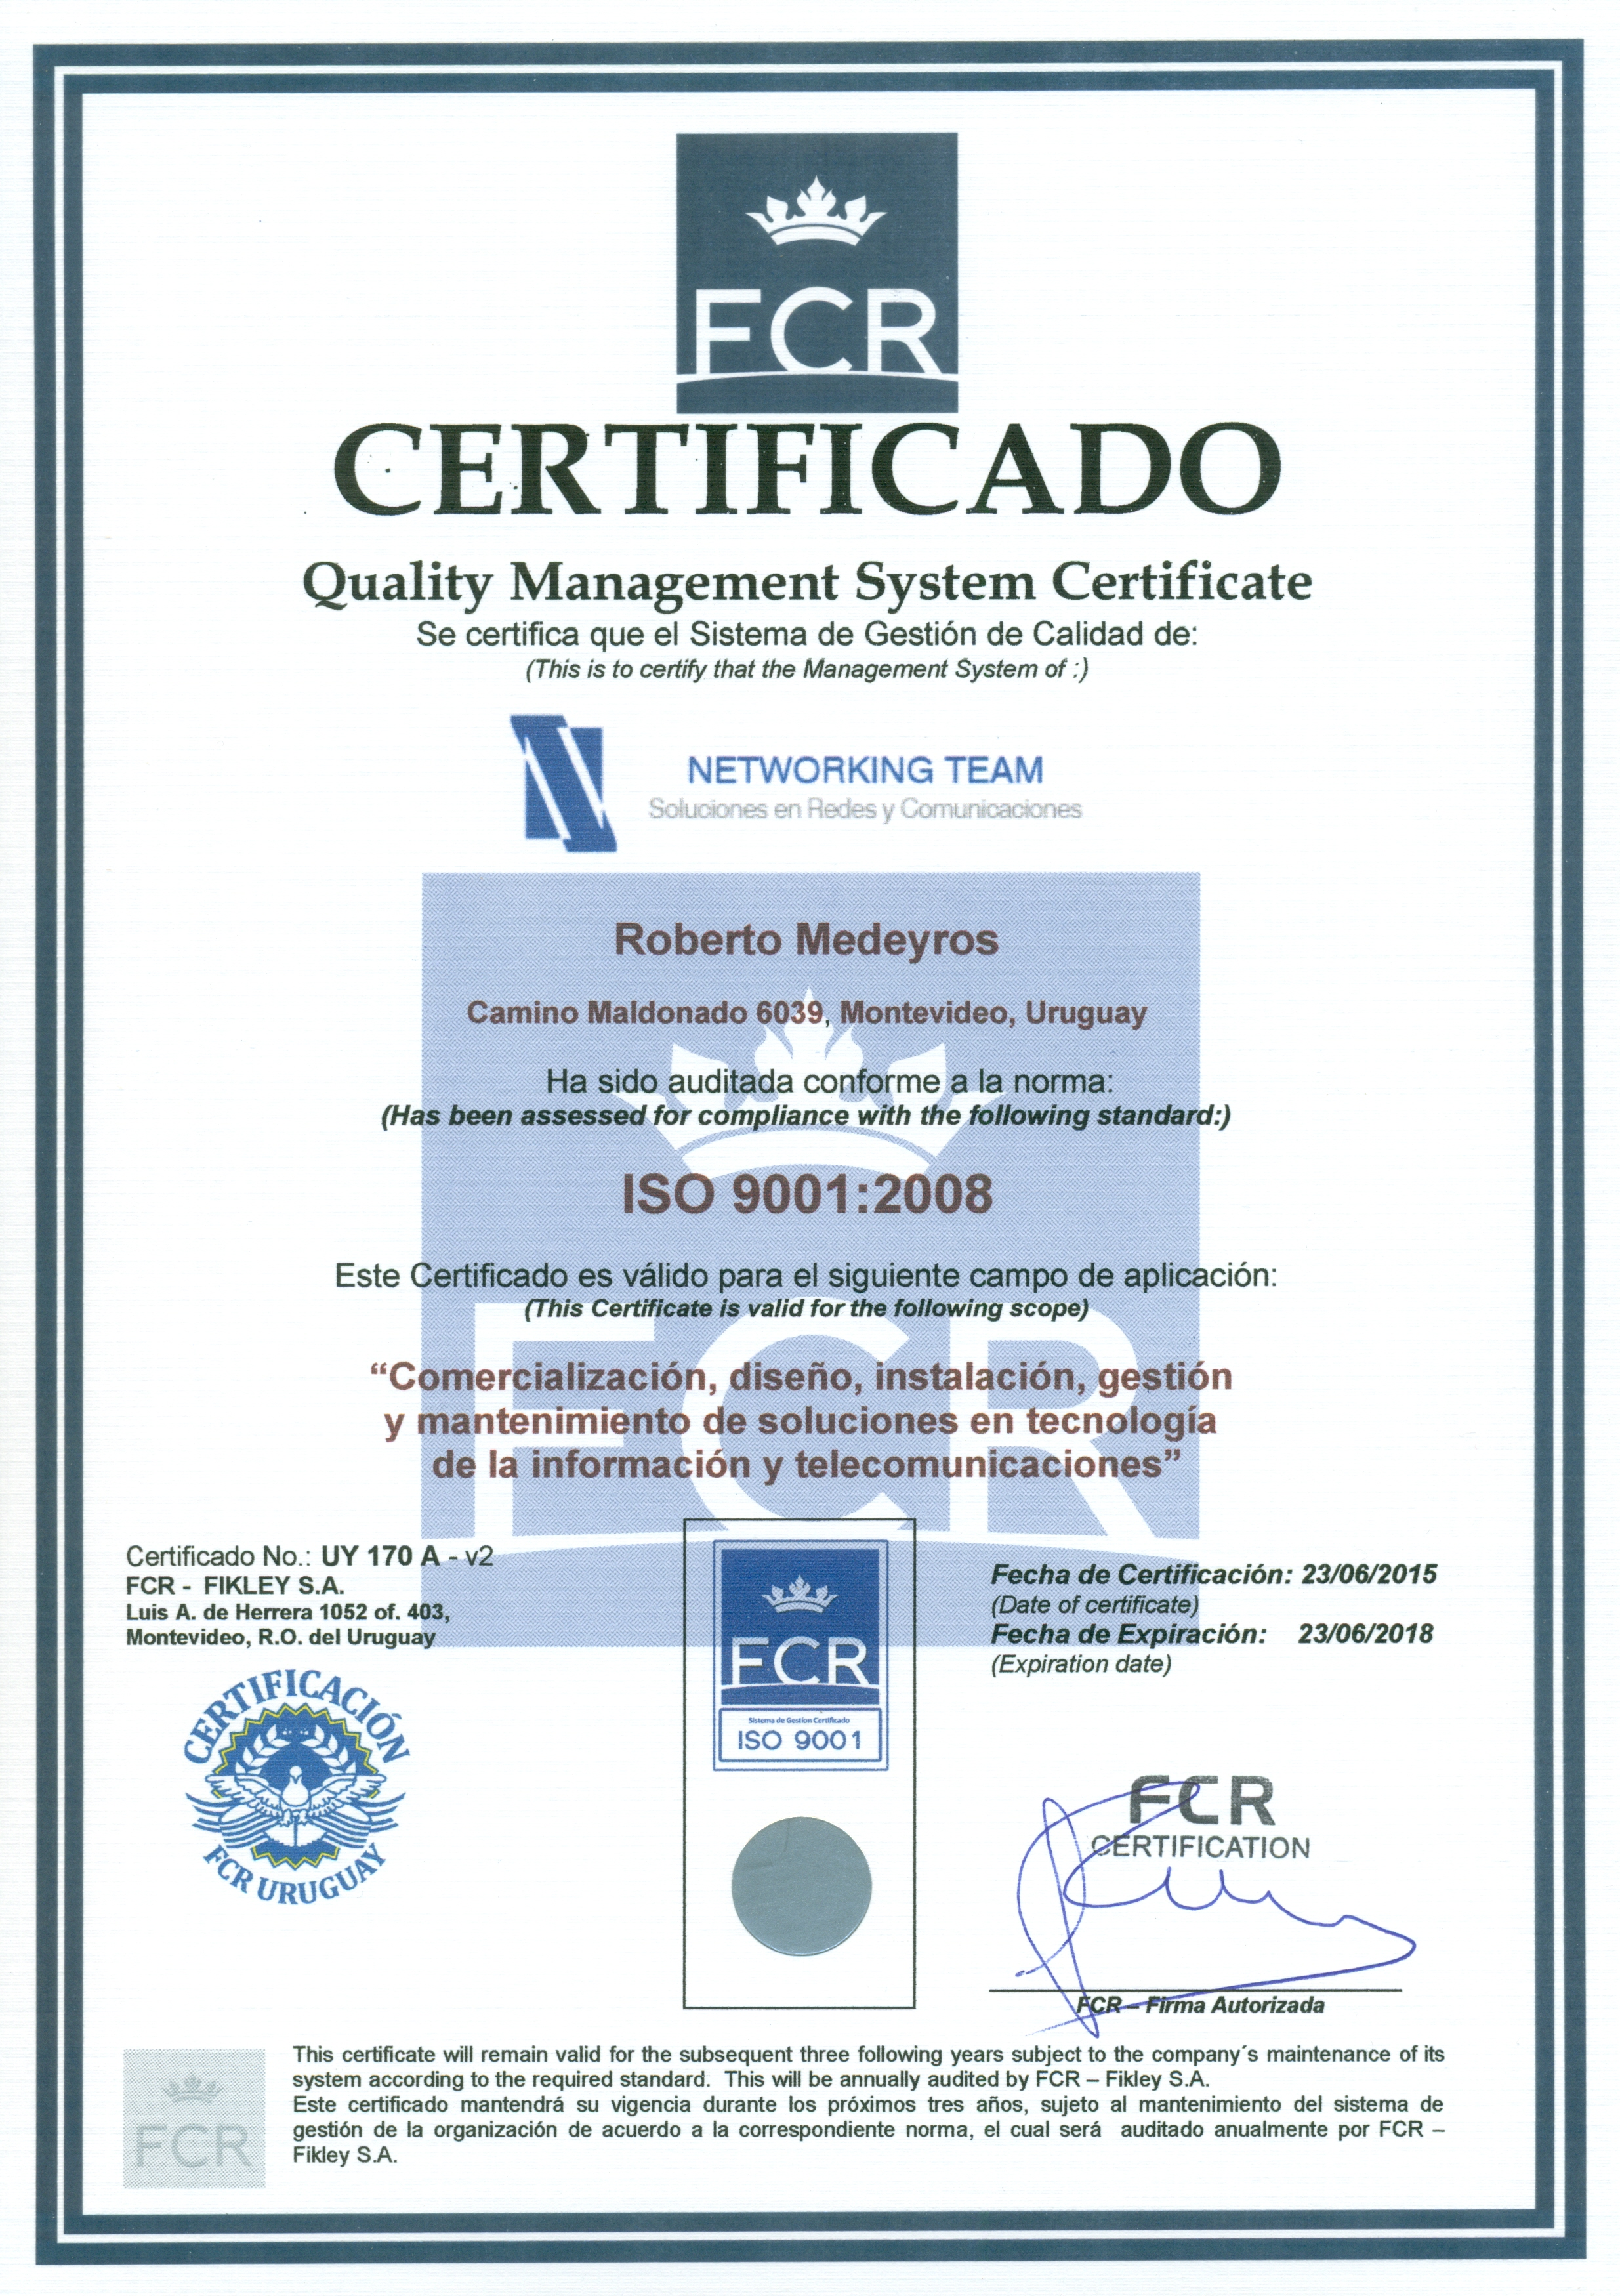 FCR Roberto Medeyros